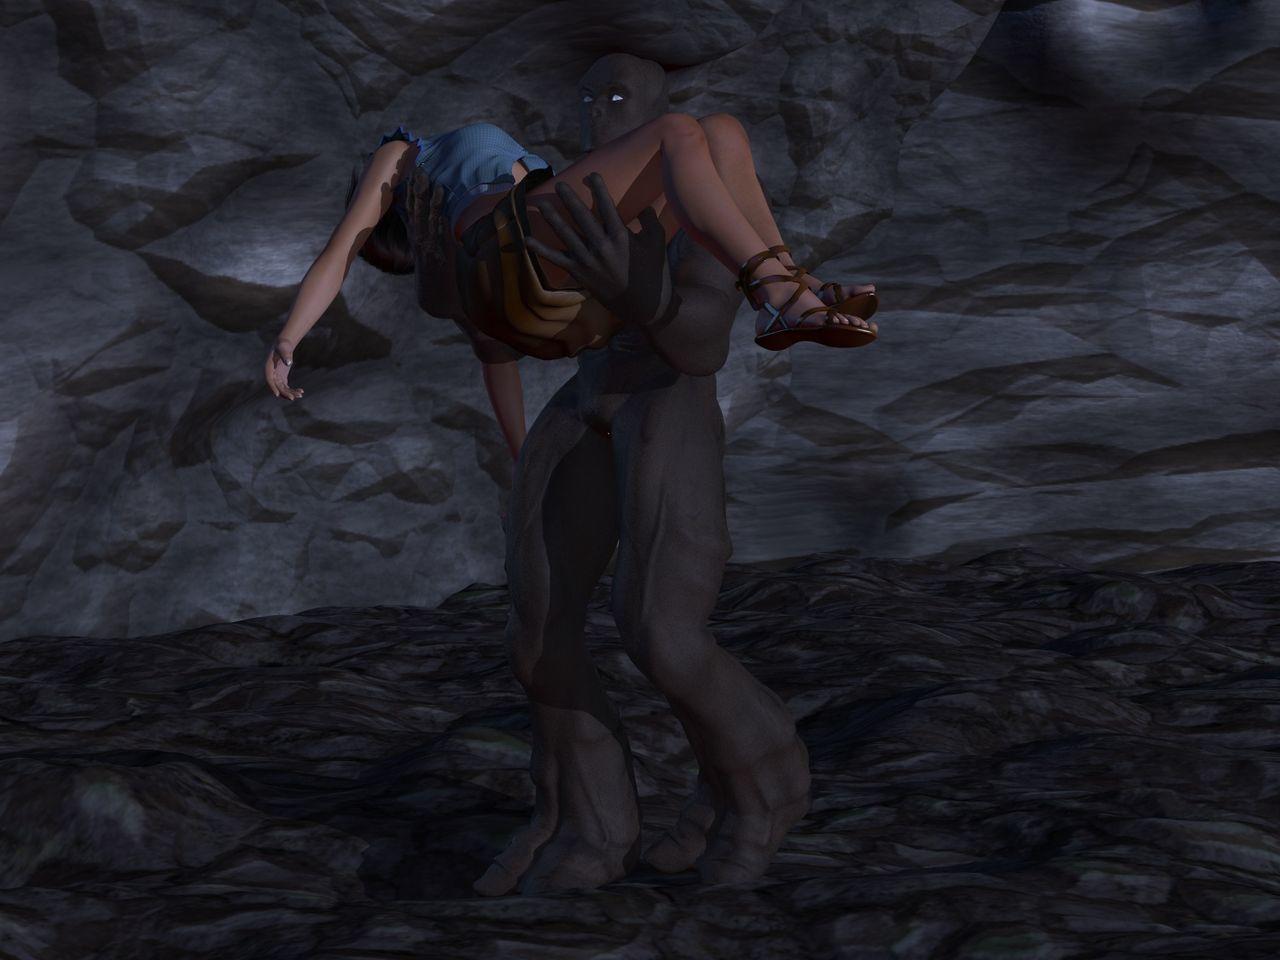 [babblingfaces] The Slavers Trail